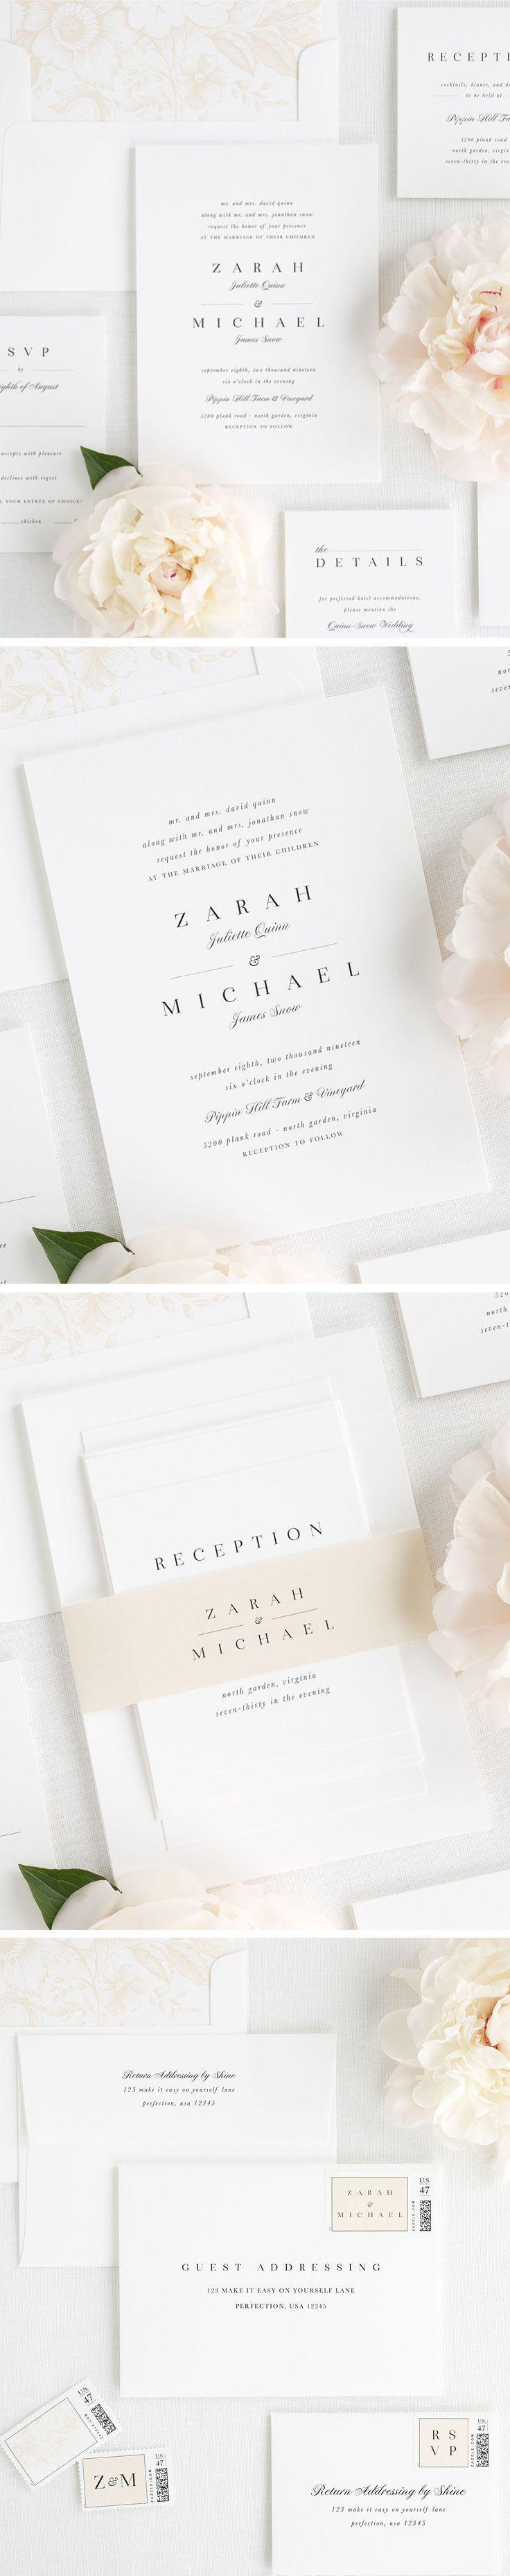 Design your own wedding dress for fun  Zarah Wedding Invitations  Wedding invitations  Pinterest